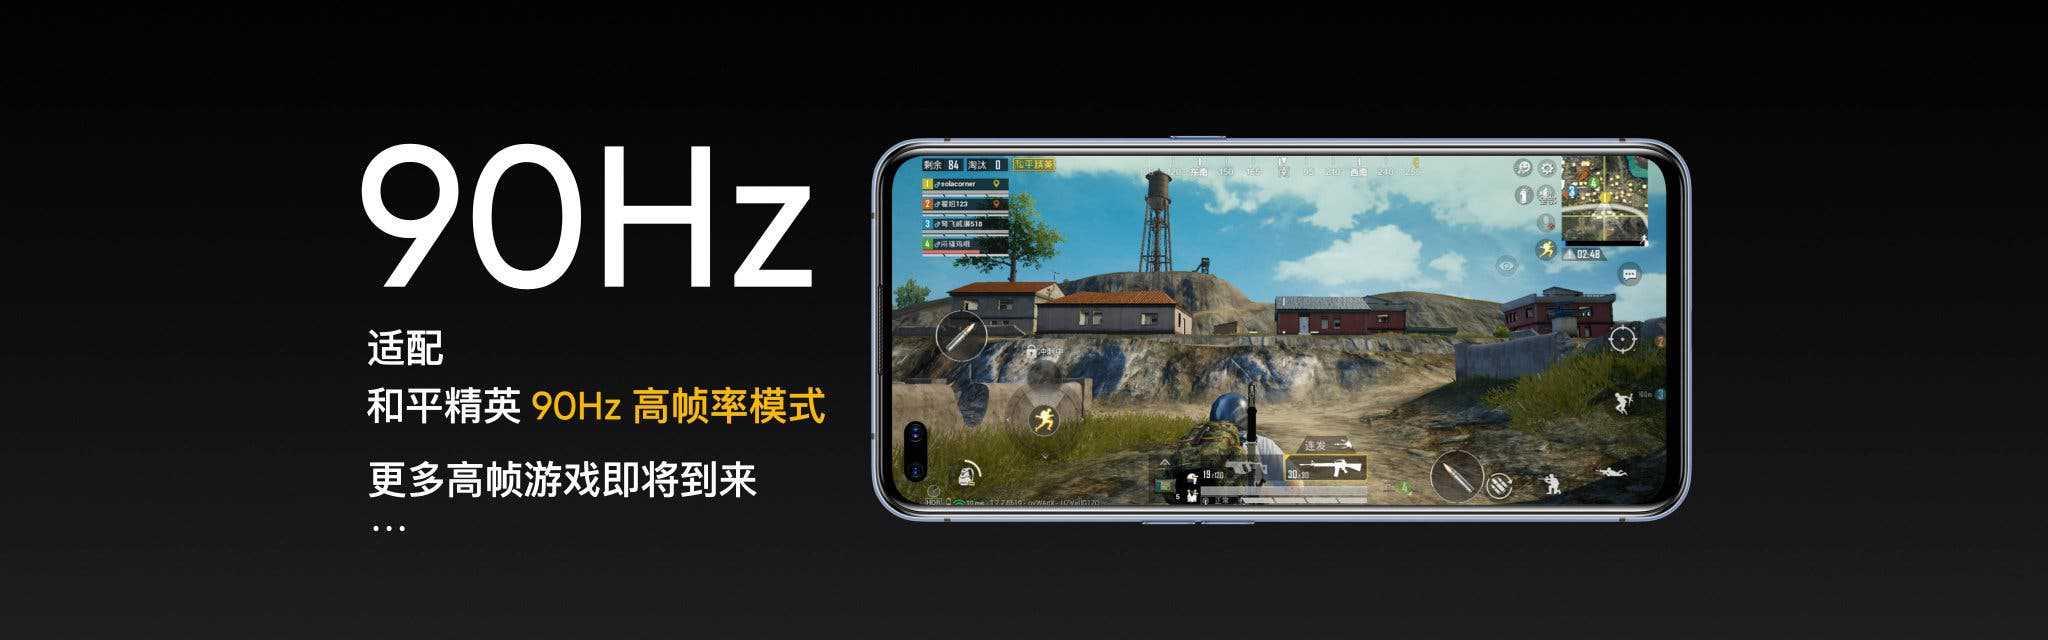 https://www.gizchina.com/wp-content/uploads/images/2020/05/EY16fiMU0AAtnRV.jpg